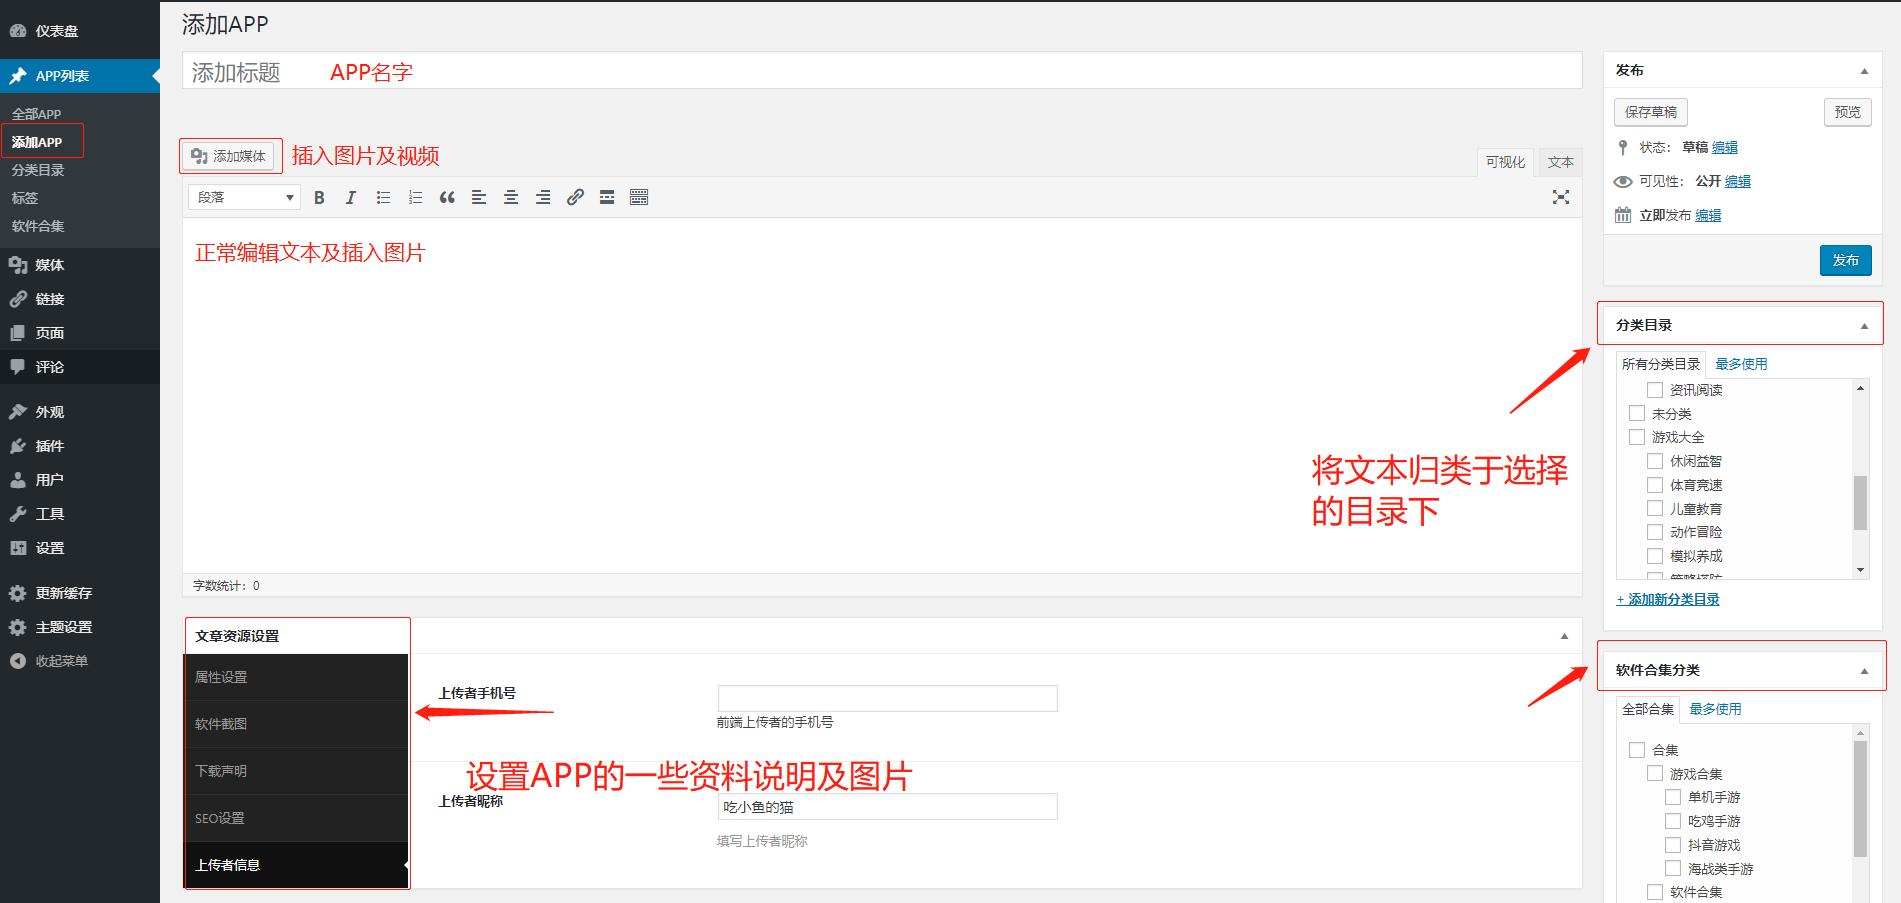 wpzt-appro主題使用教程 (https://www.yunsxr.com/) WordPress教程 第6张